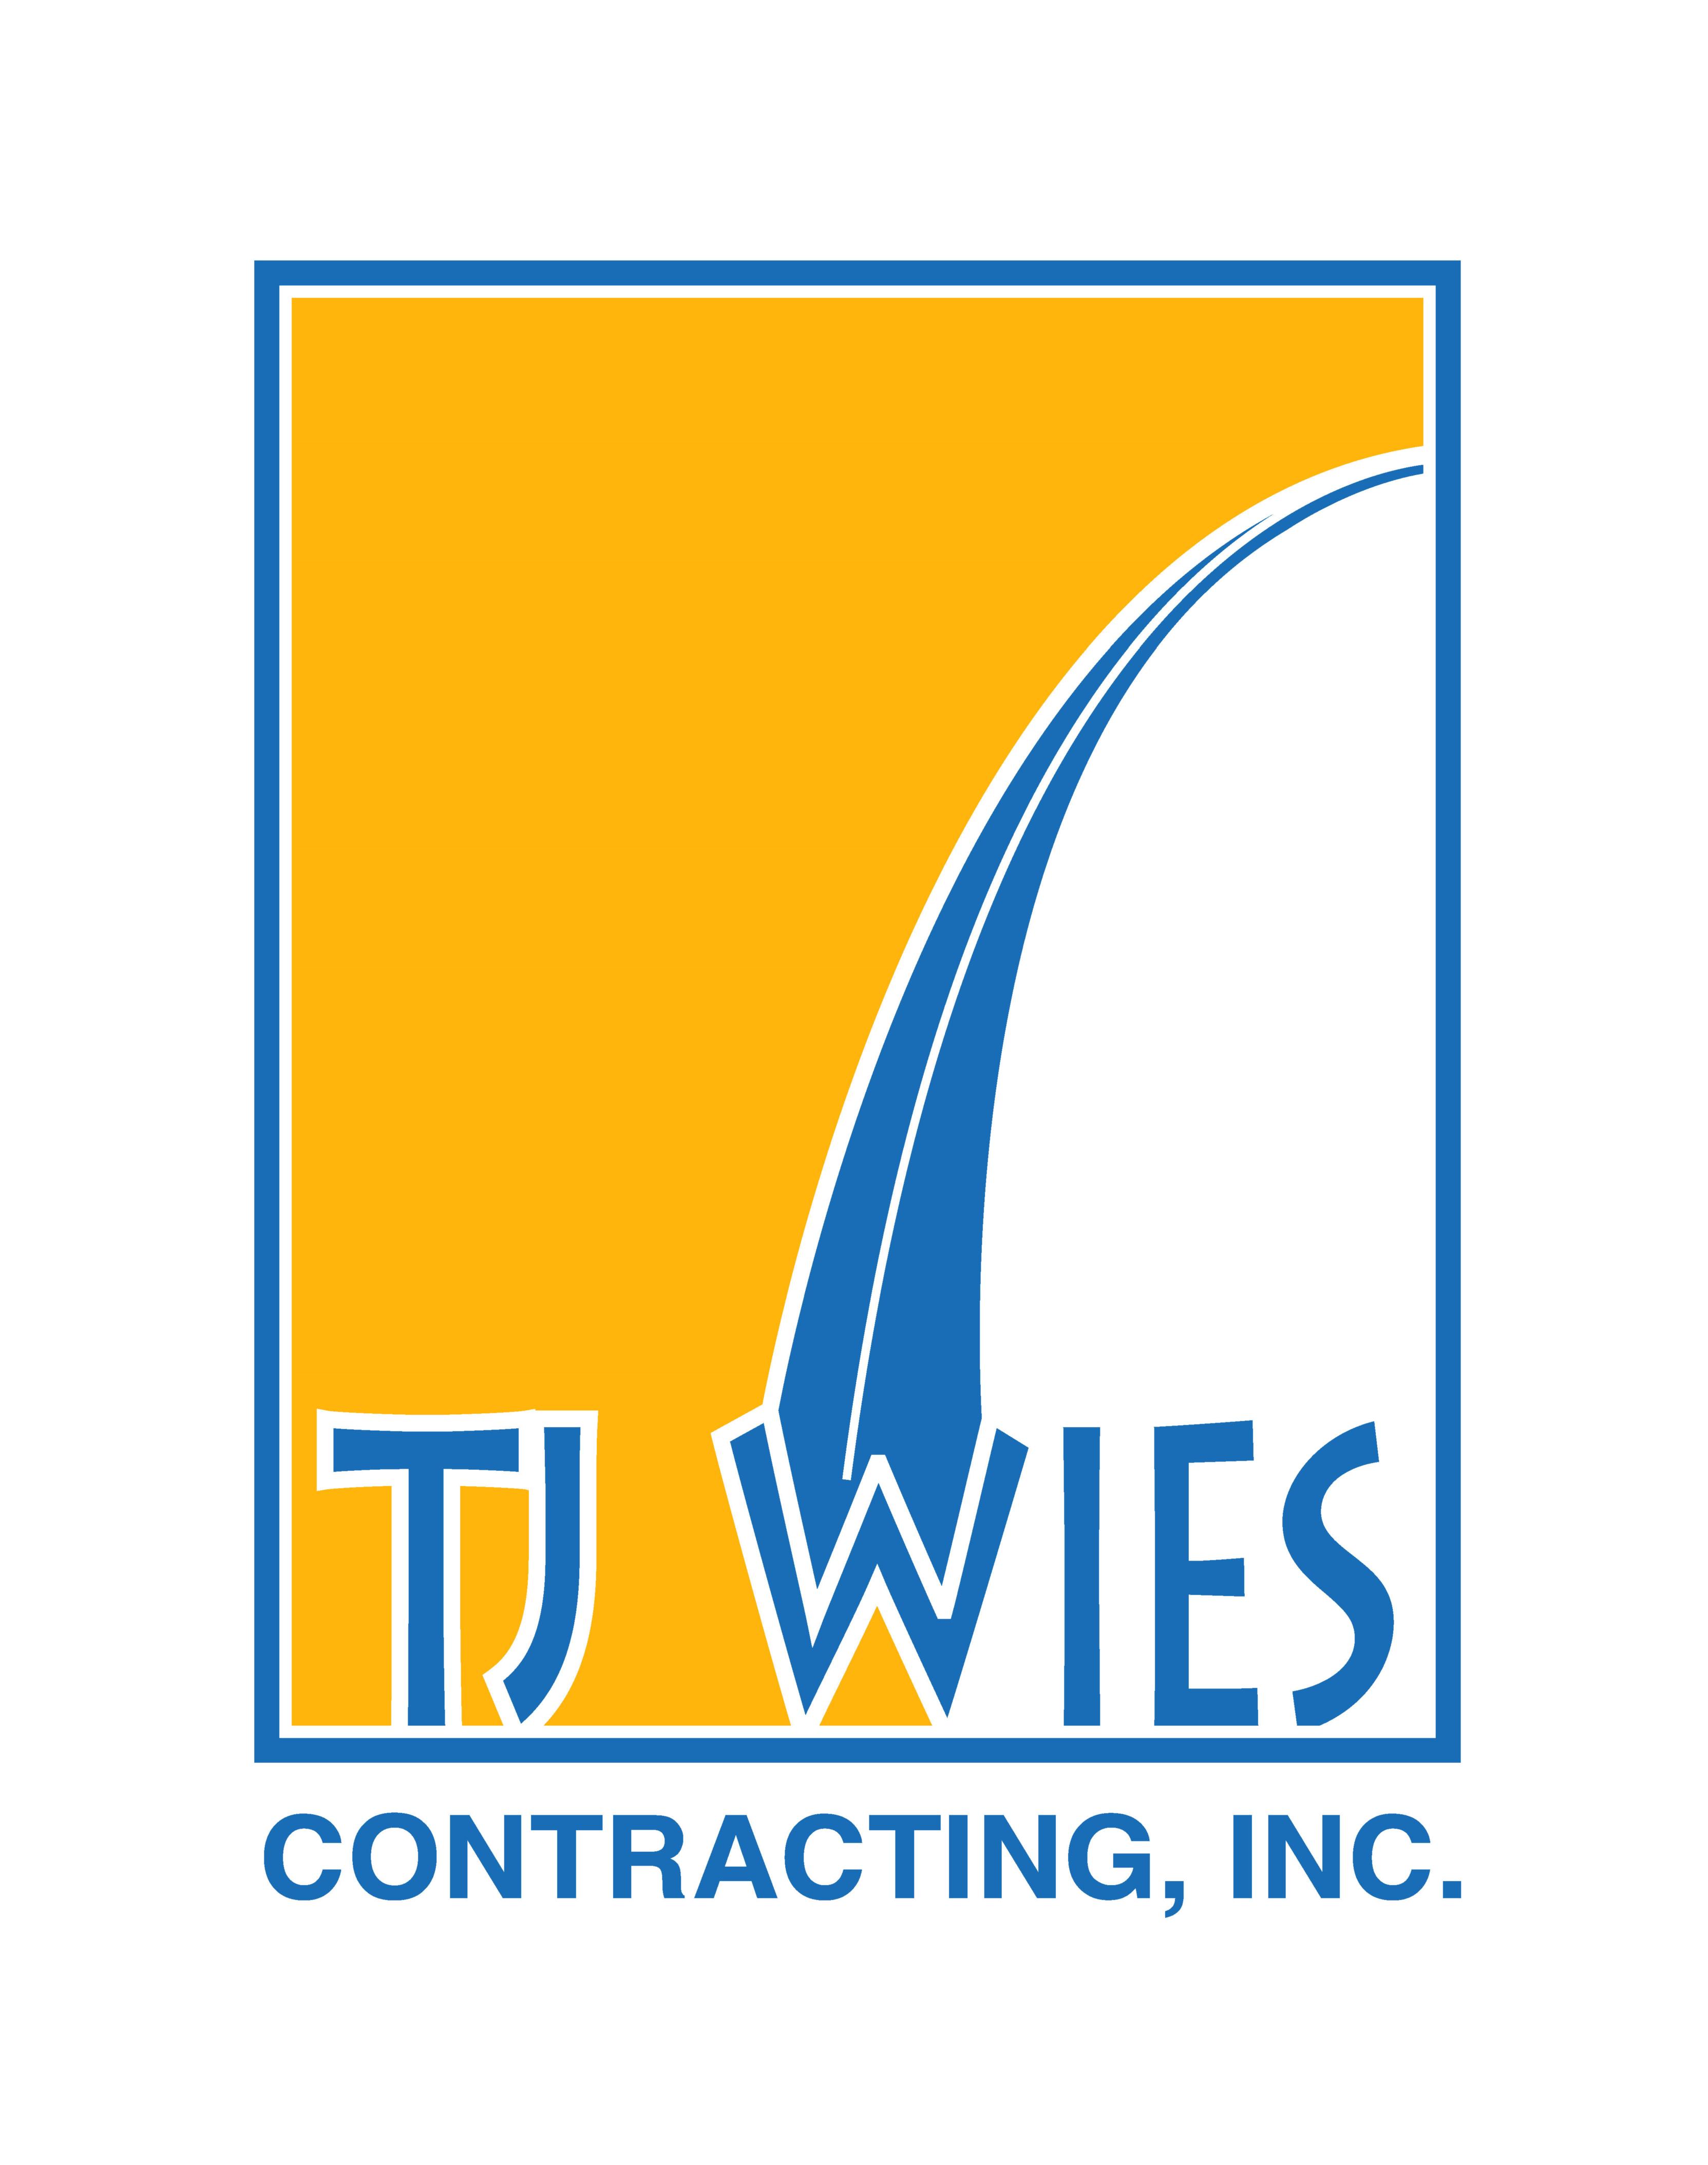 TJ Wies Contracting, Inc. logo